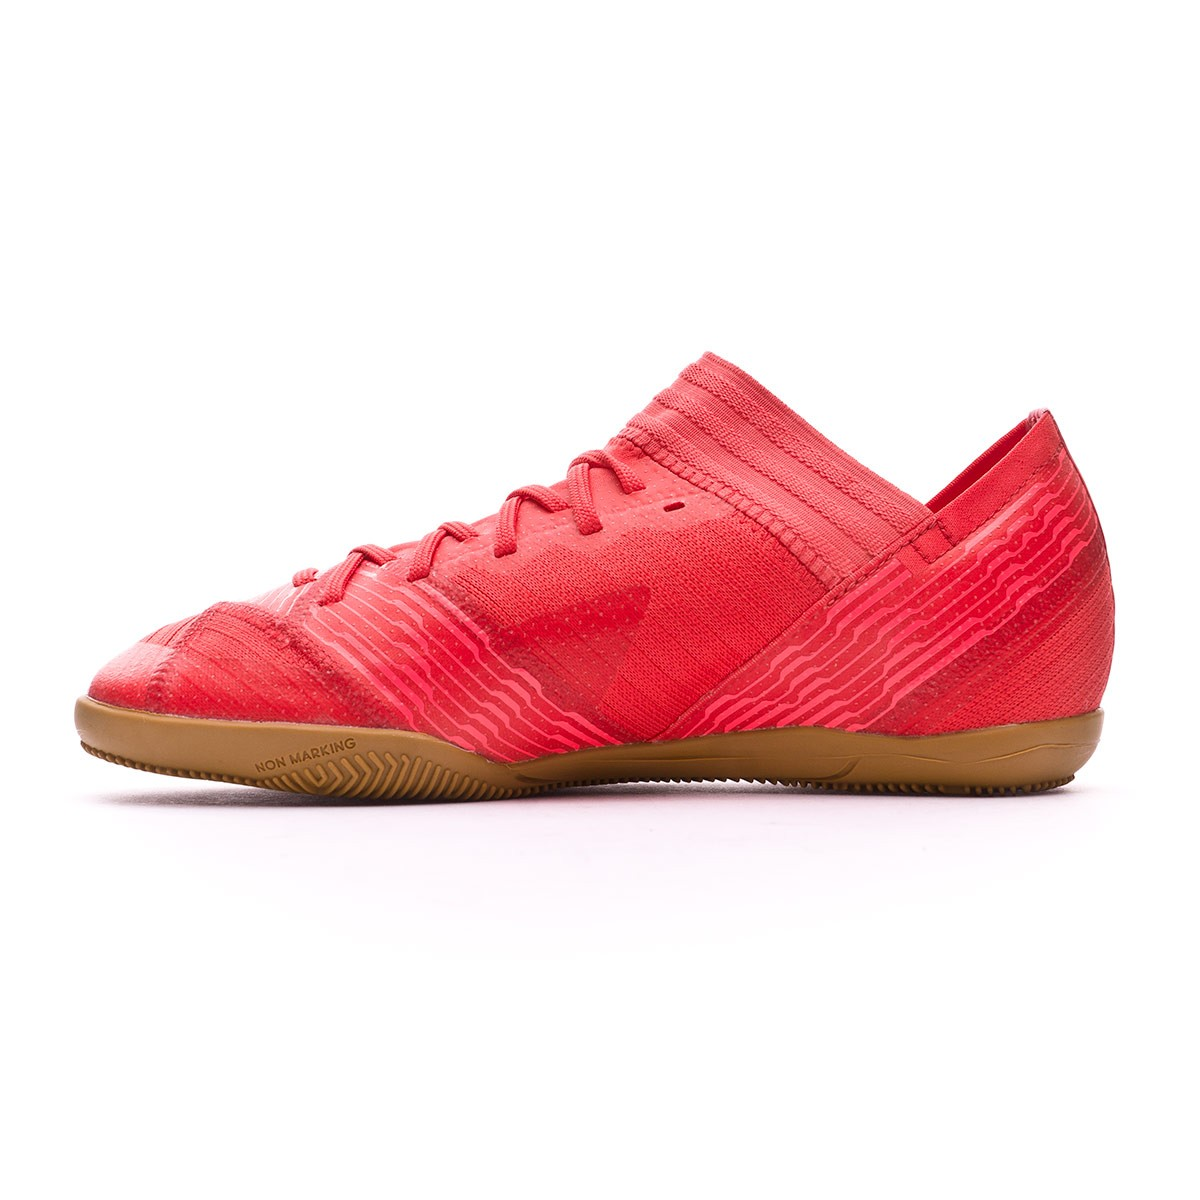 Zapatilla Red Nemeziz 3 Niño In 17 Real Tango Coral Zest AR54j3L